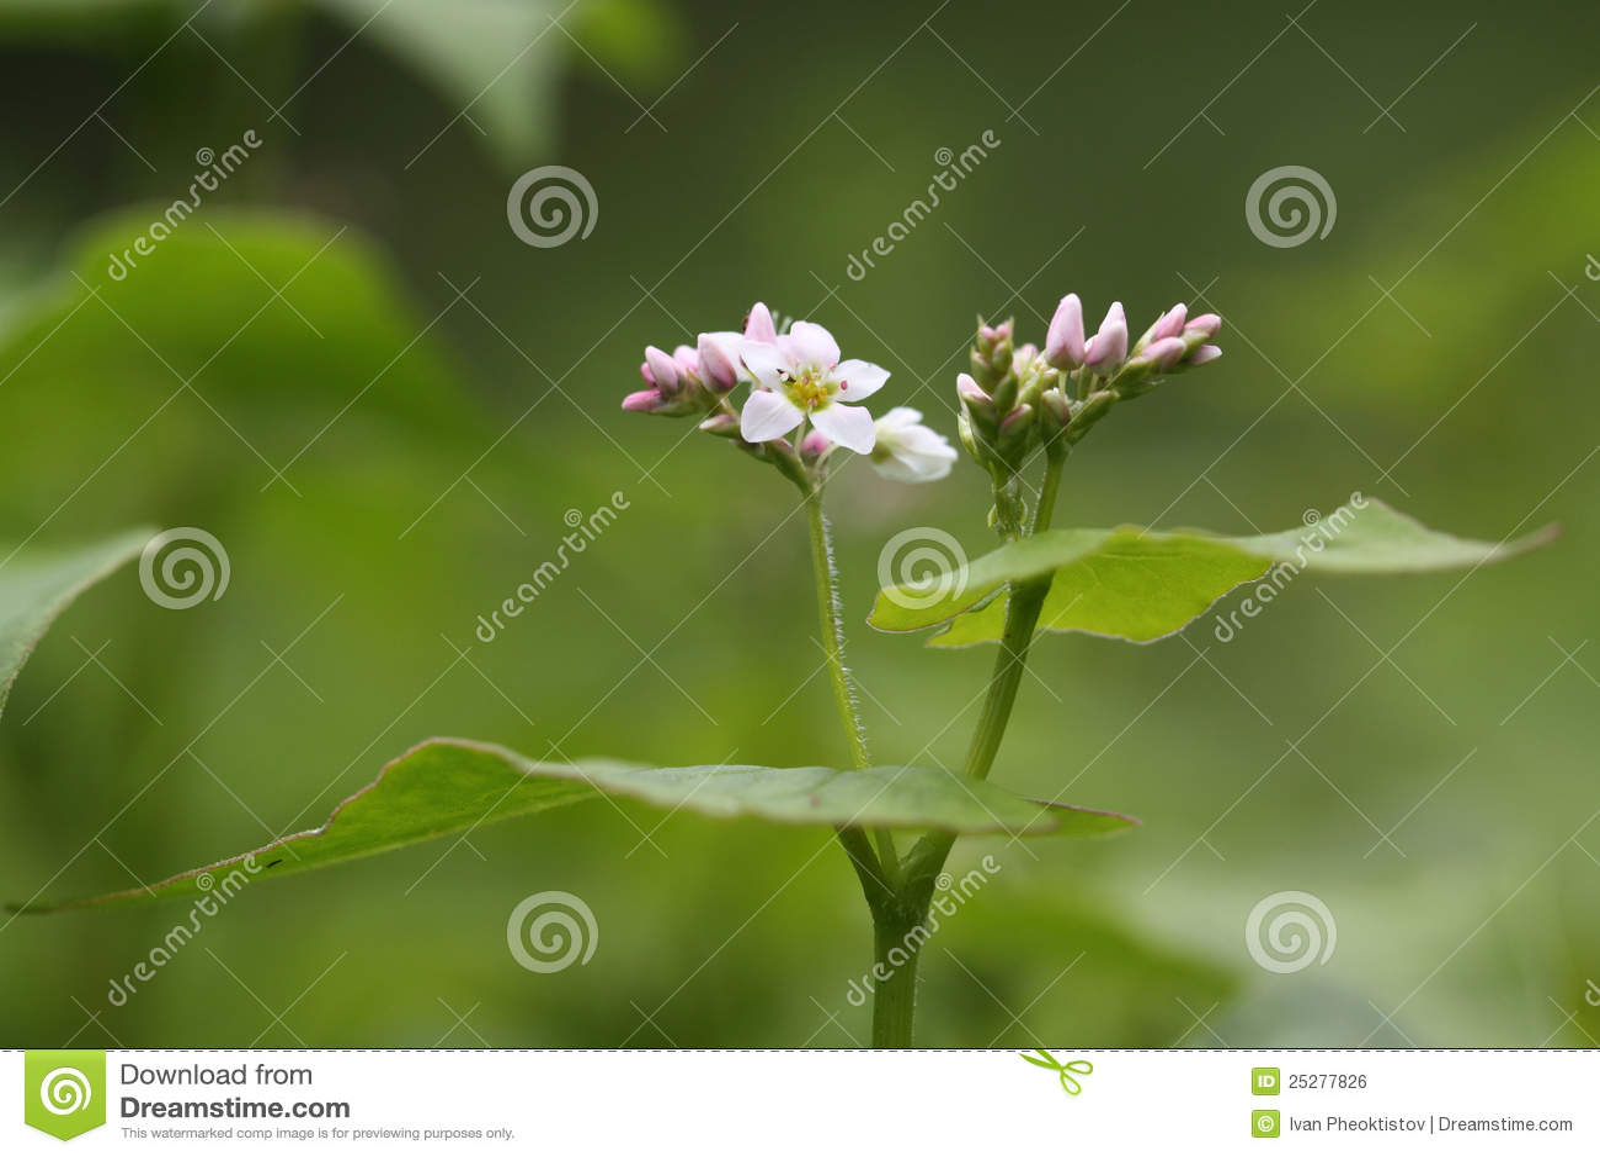 sarrasin dans la fleur photo stock image du bleu ciel 25277826. Black Bedroom Furniture Sets. Home Design Ideas